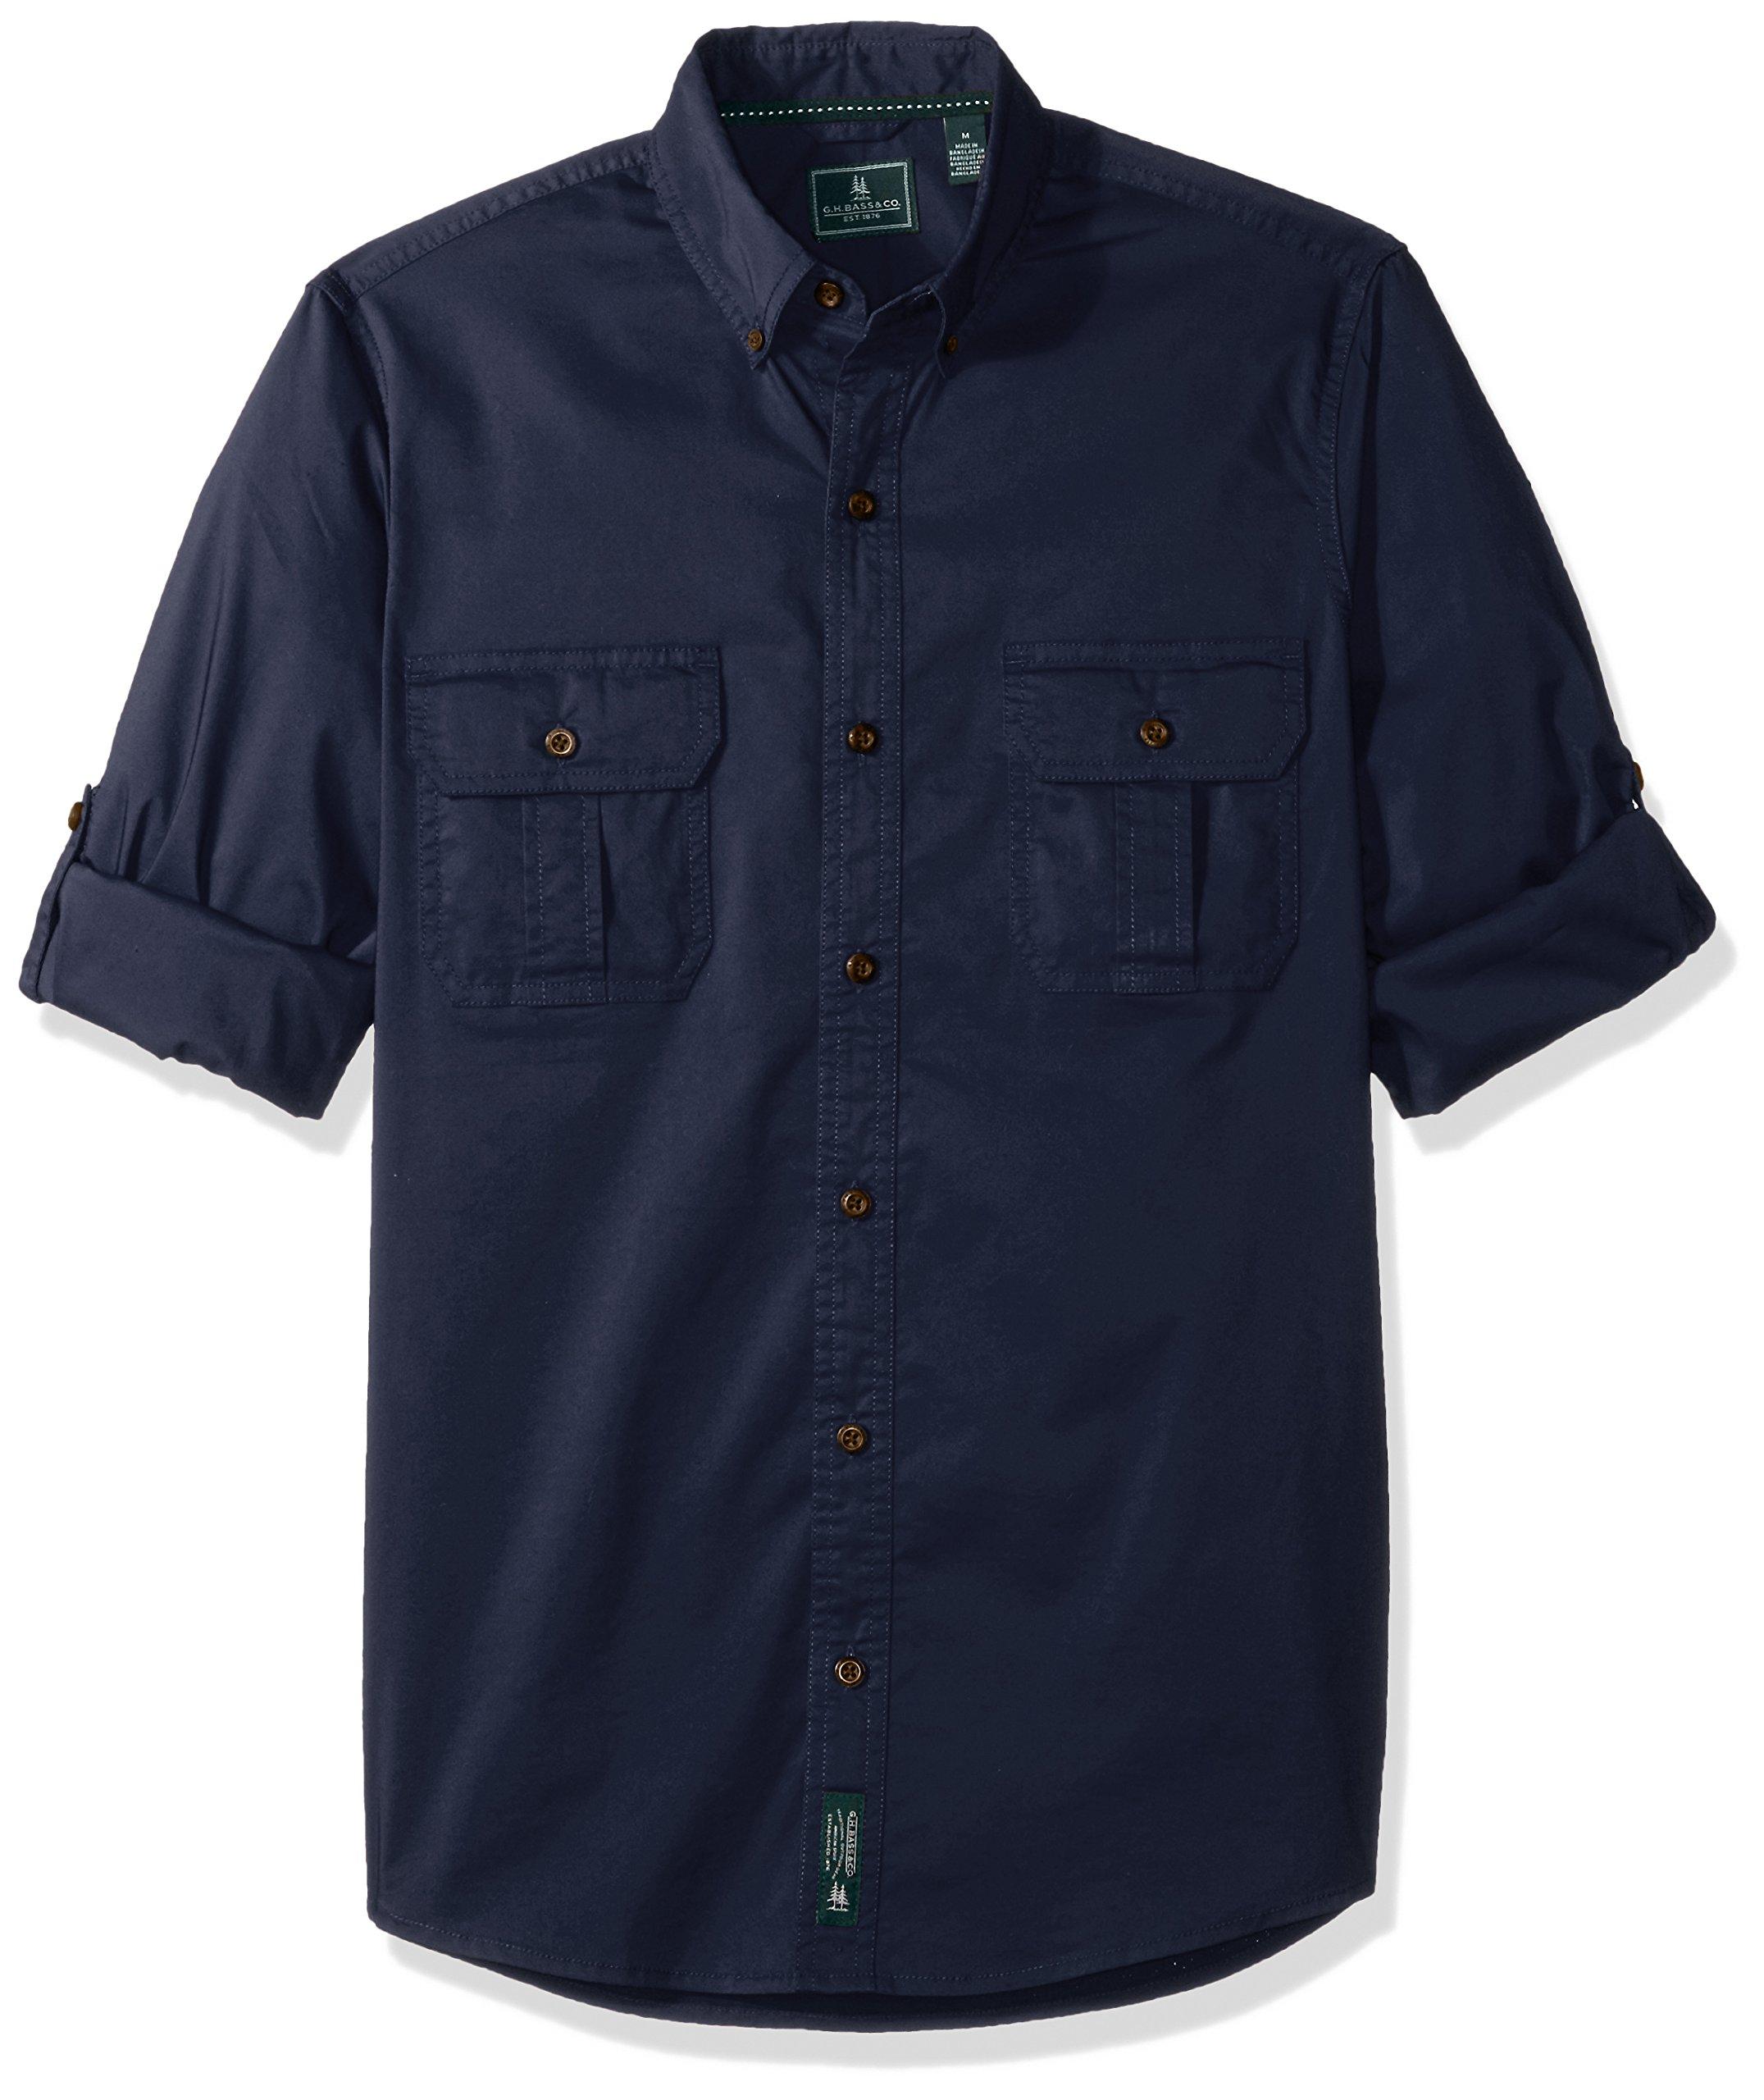 G.H. Bass & Co. Men's Madawaska Trail Long Sleeve Shirt, Navy Blazer, X-Large